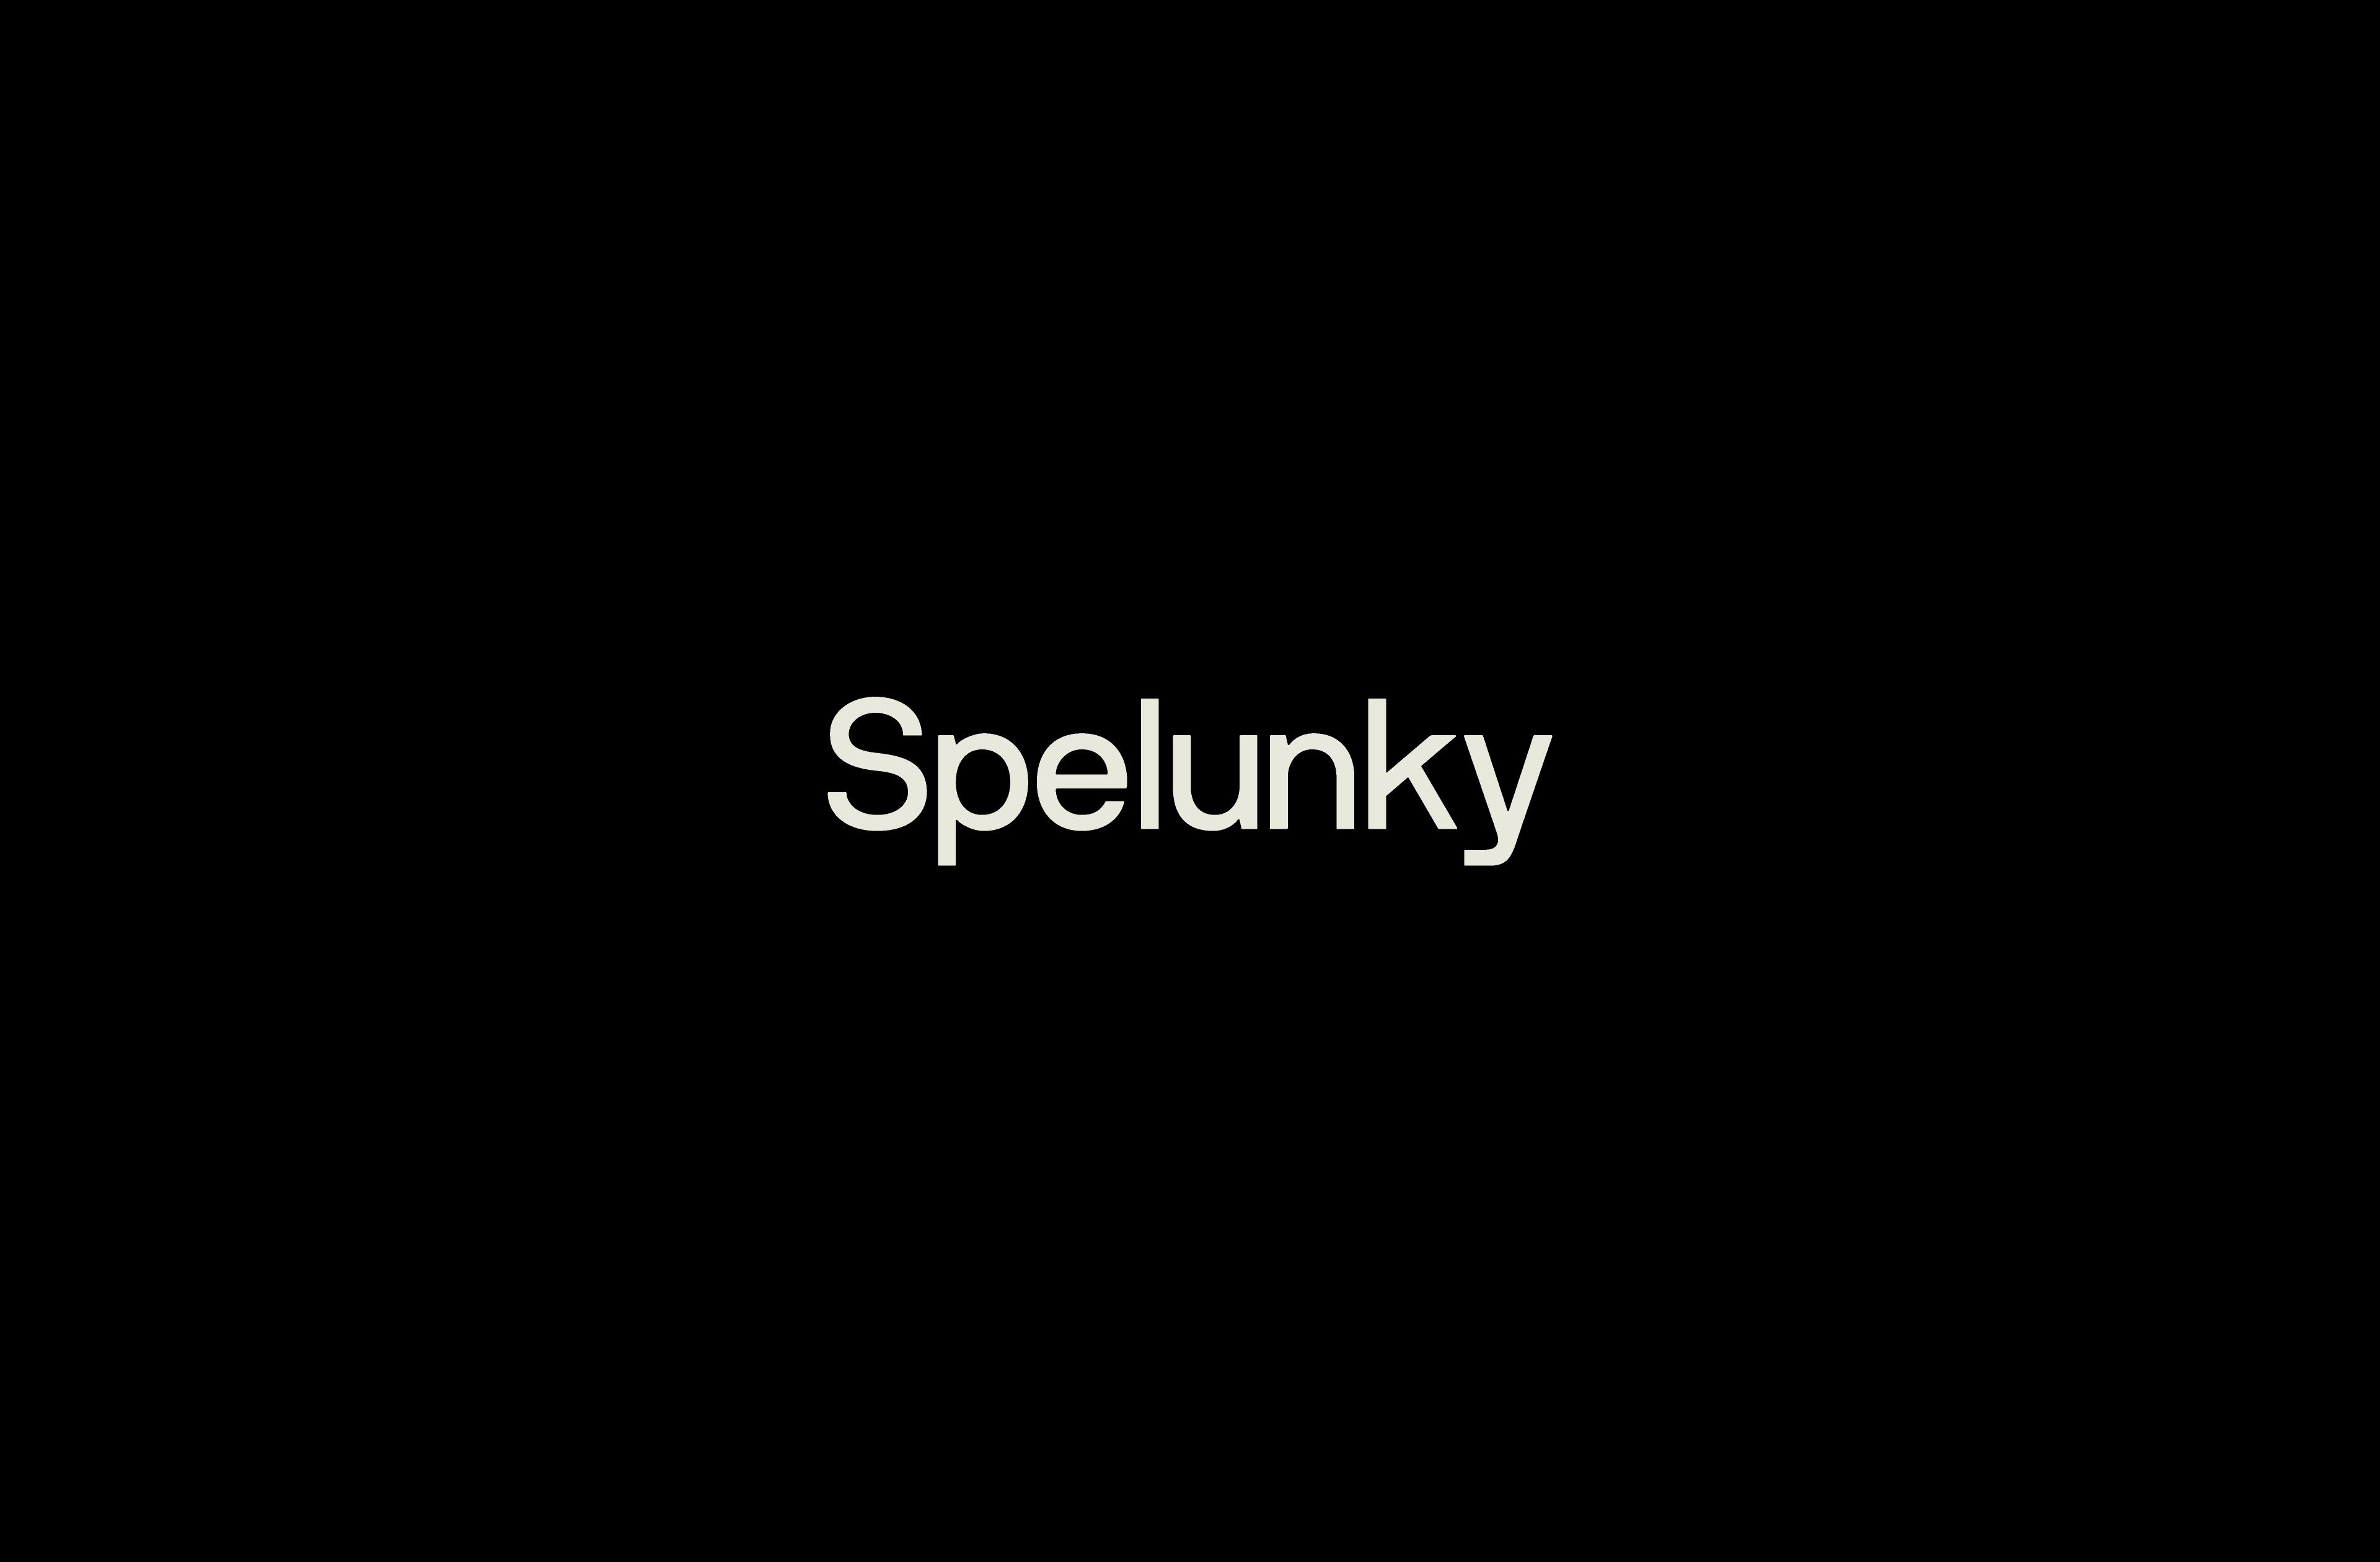 Spelunky-type-2x